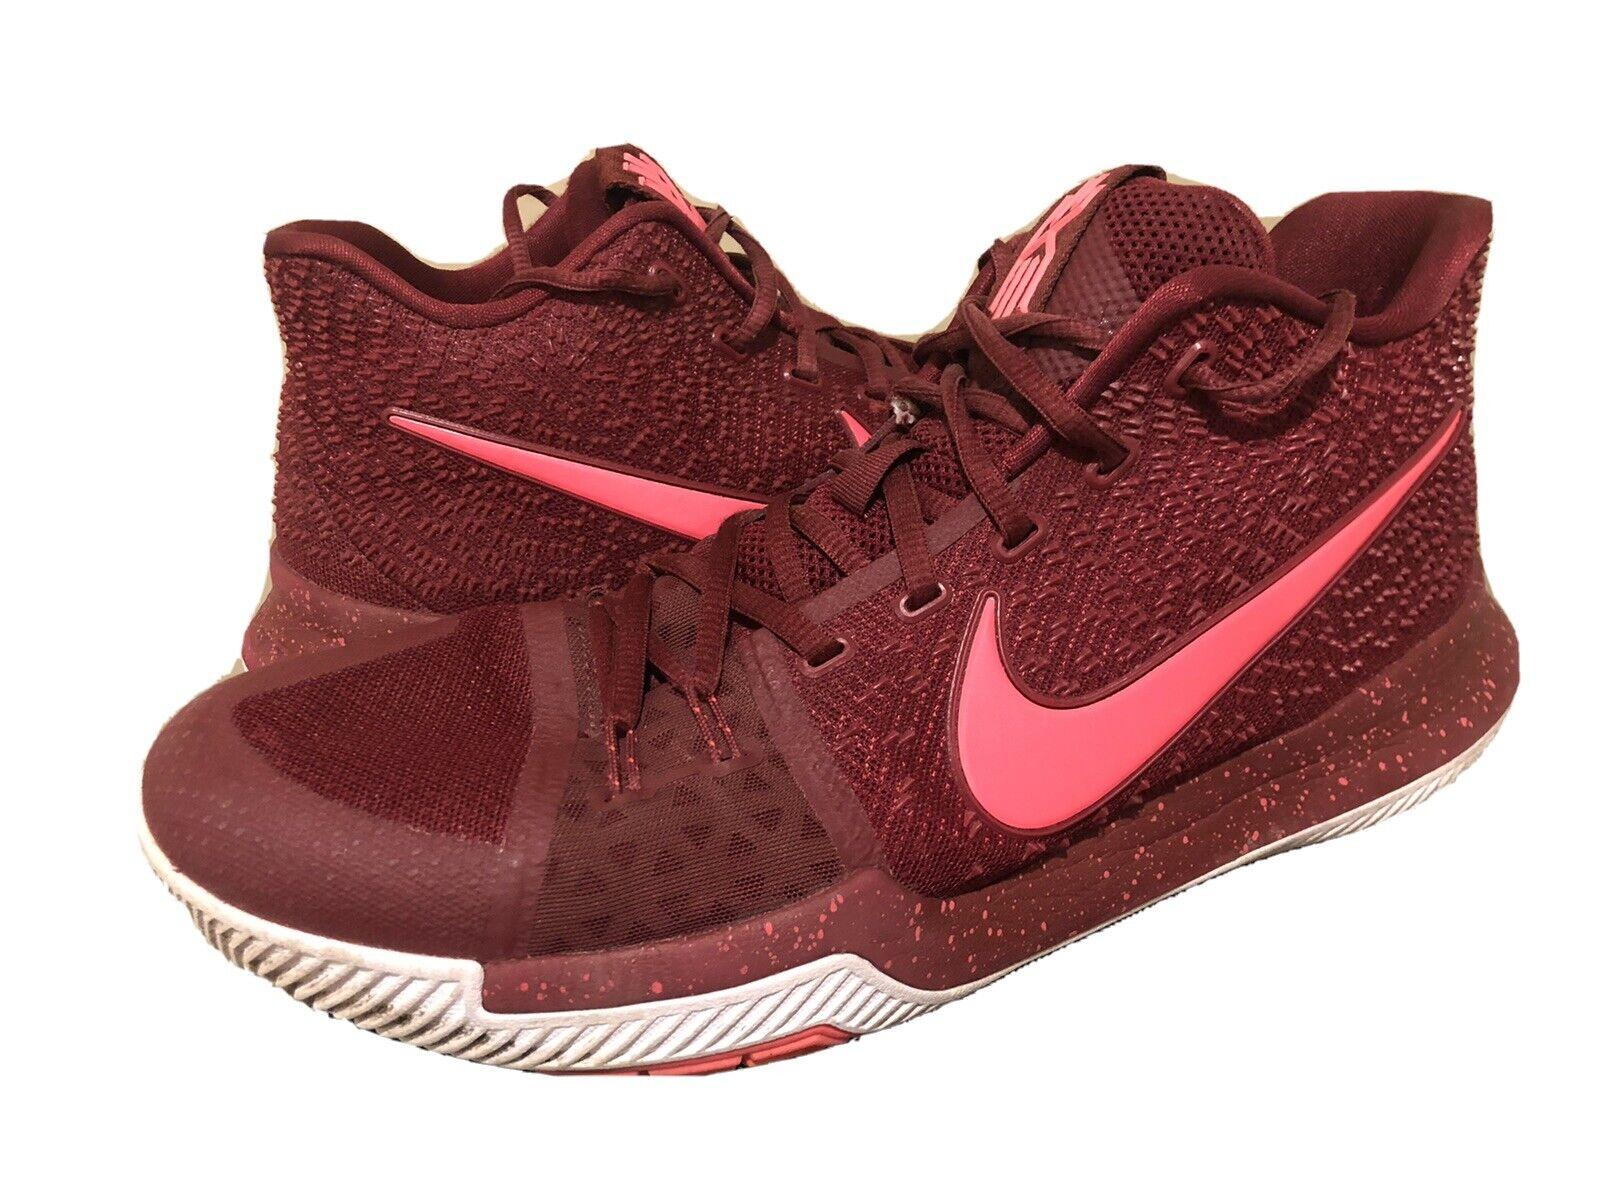 Nike Kyrie 3 III Men Basketball Shoes